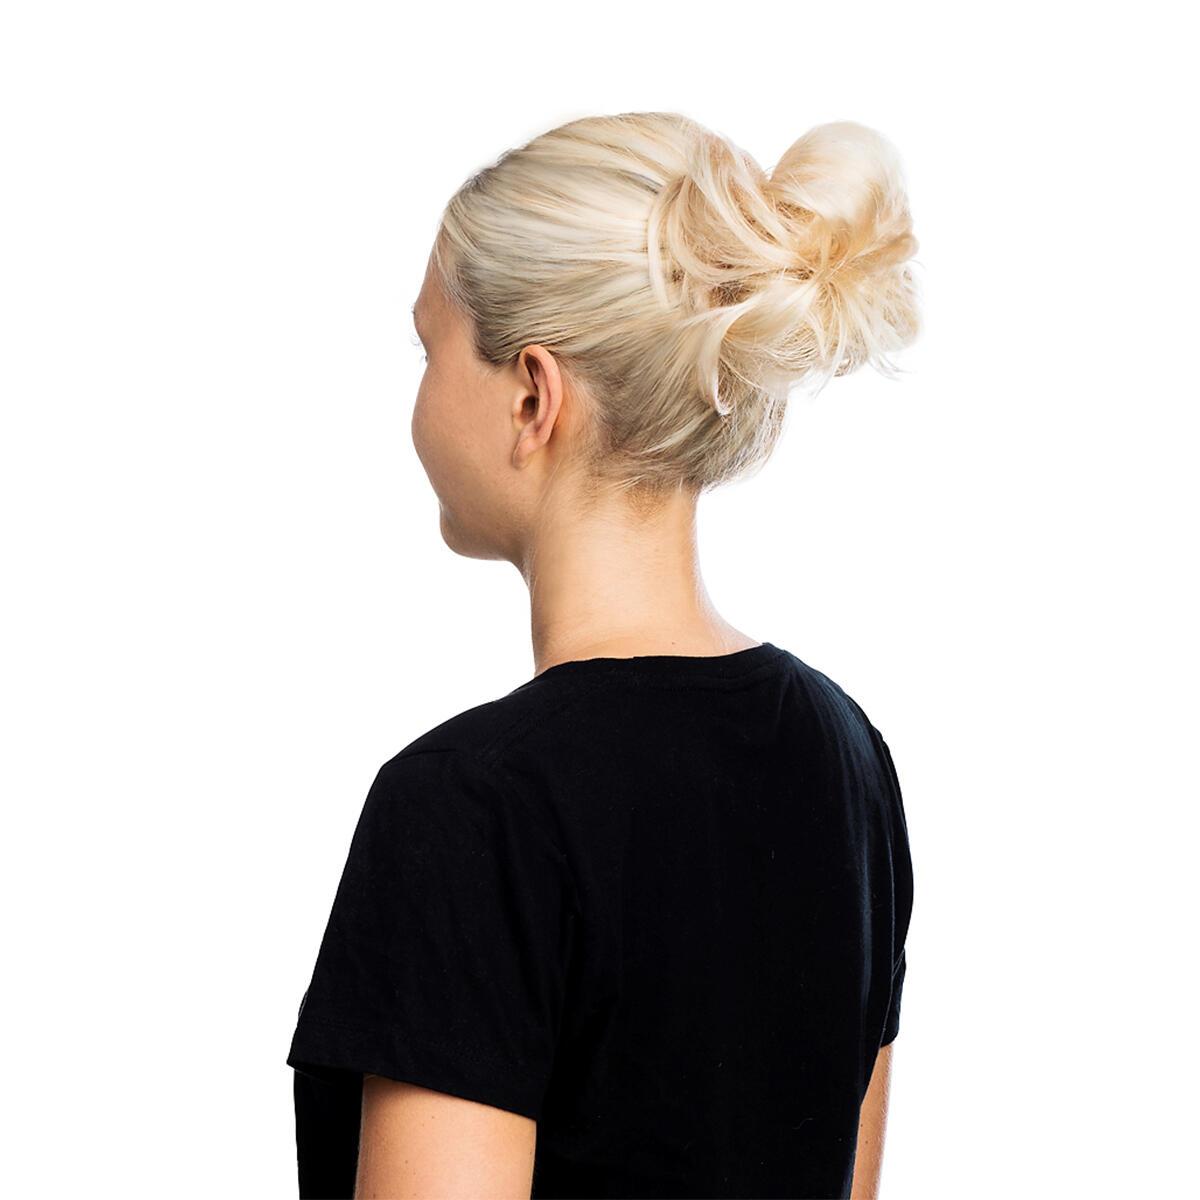 Volume Hair Scrunchie M7.8/10.8 Light Golden Mix